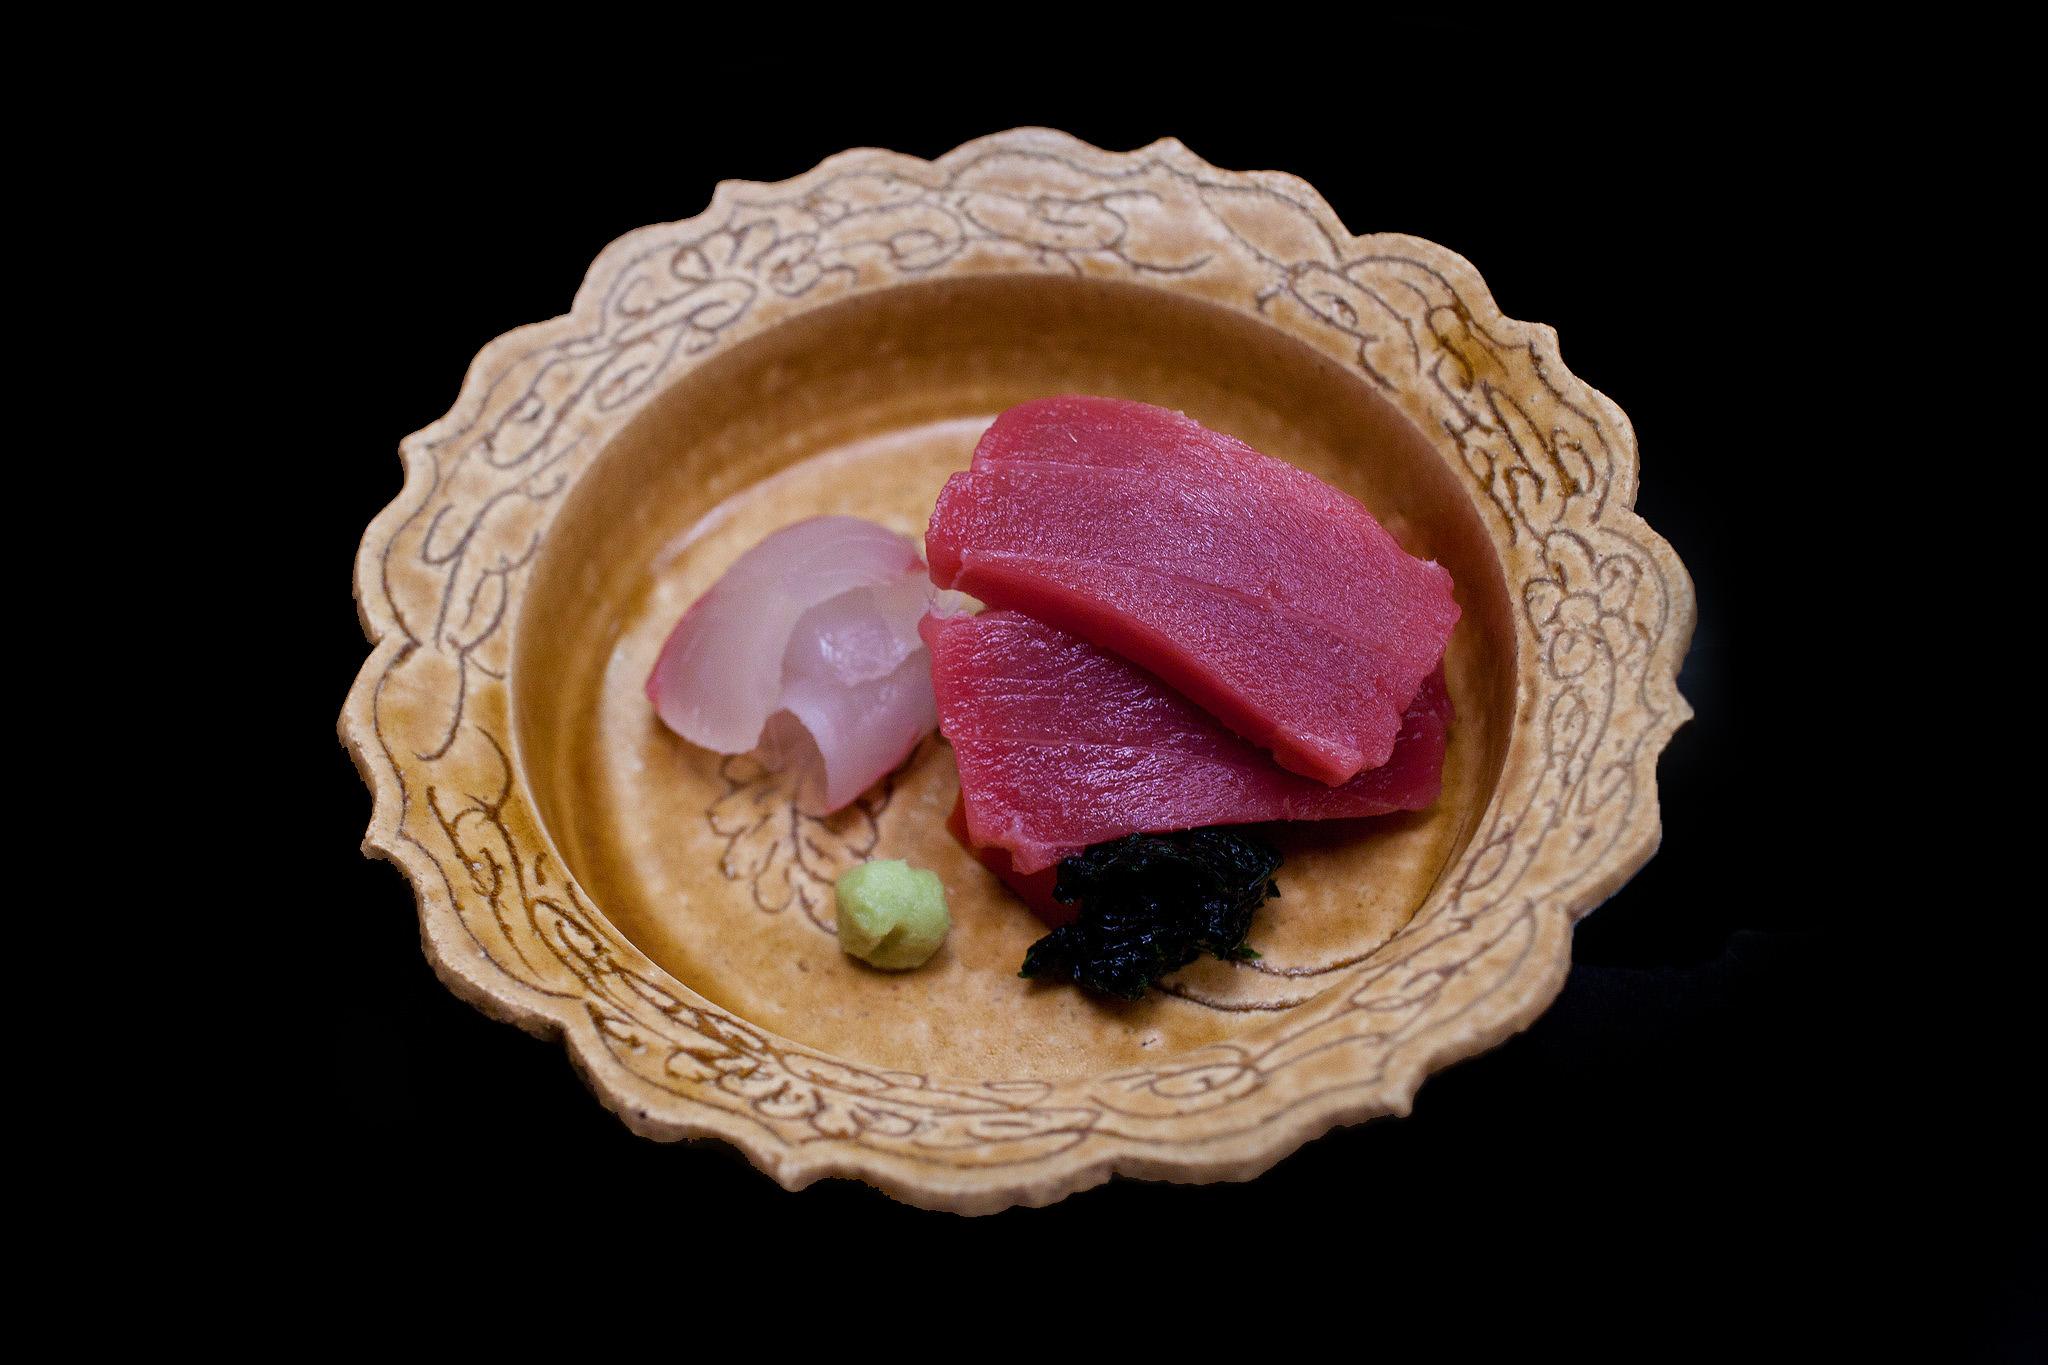 Chihana, Kyoto, Japan - Hirame and Chuo Toro with Dried Kelp